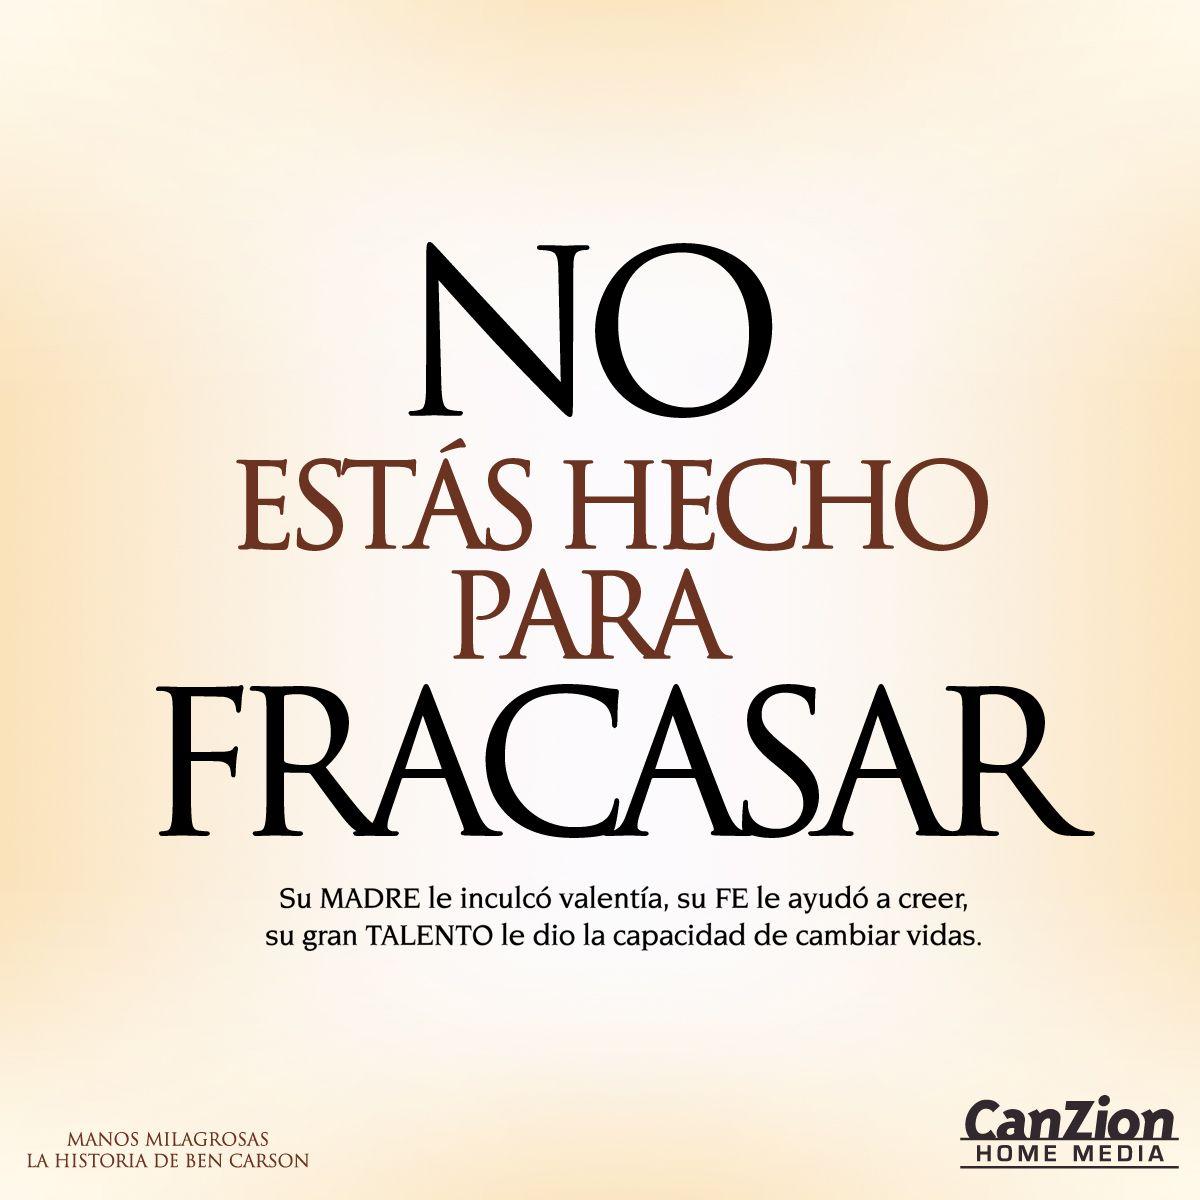 Canzion Home Media presenta #ManosMilagrosas. La historia del reconocido neurocirujano, Ben Carson, protagonizada por Cuba Gooding Jr. Disponible en #DVD  ➜ http://bit.ly/equipo_manos #HistoriasQueInspiran